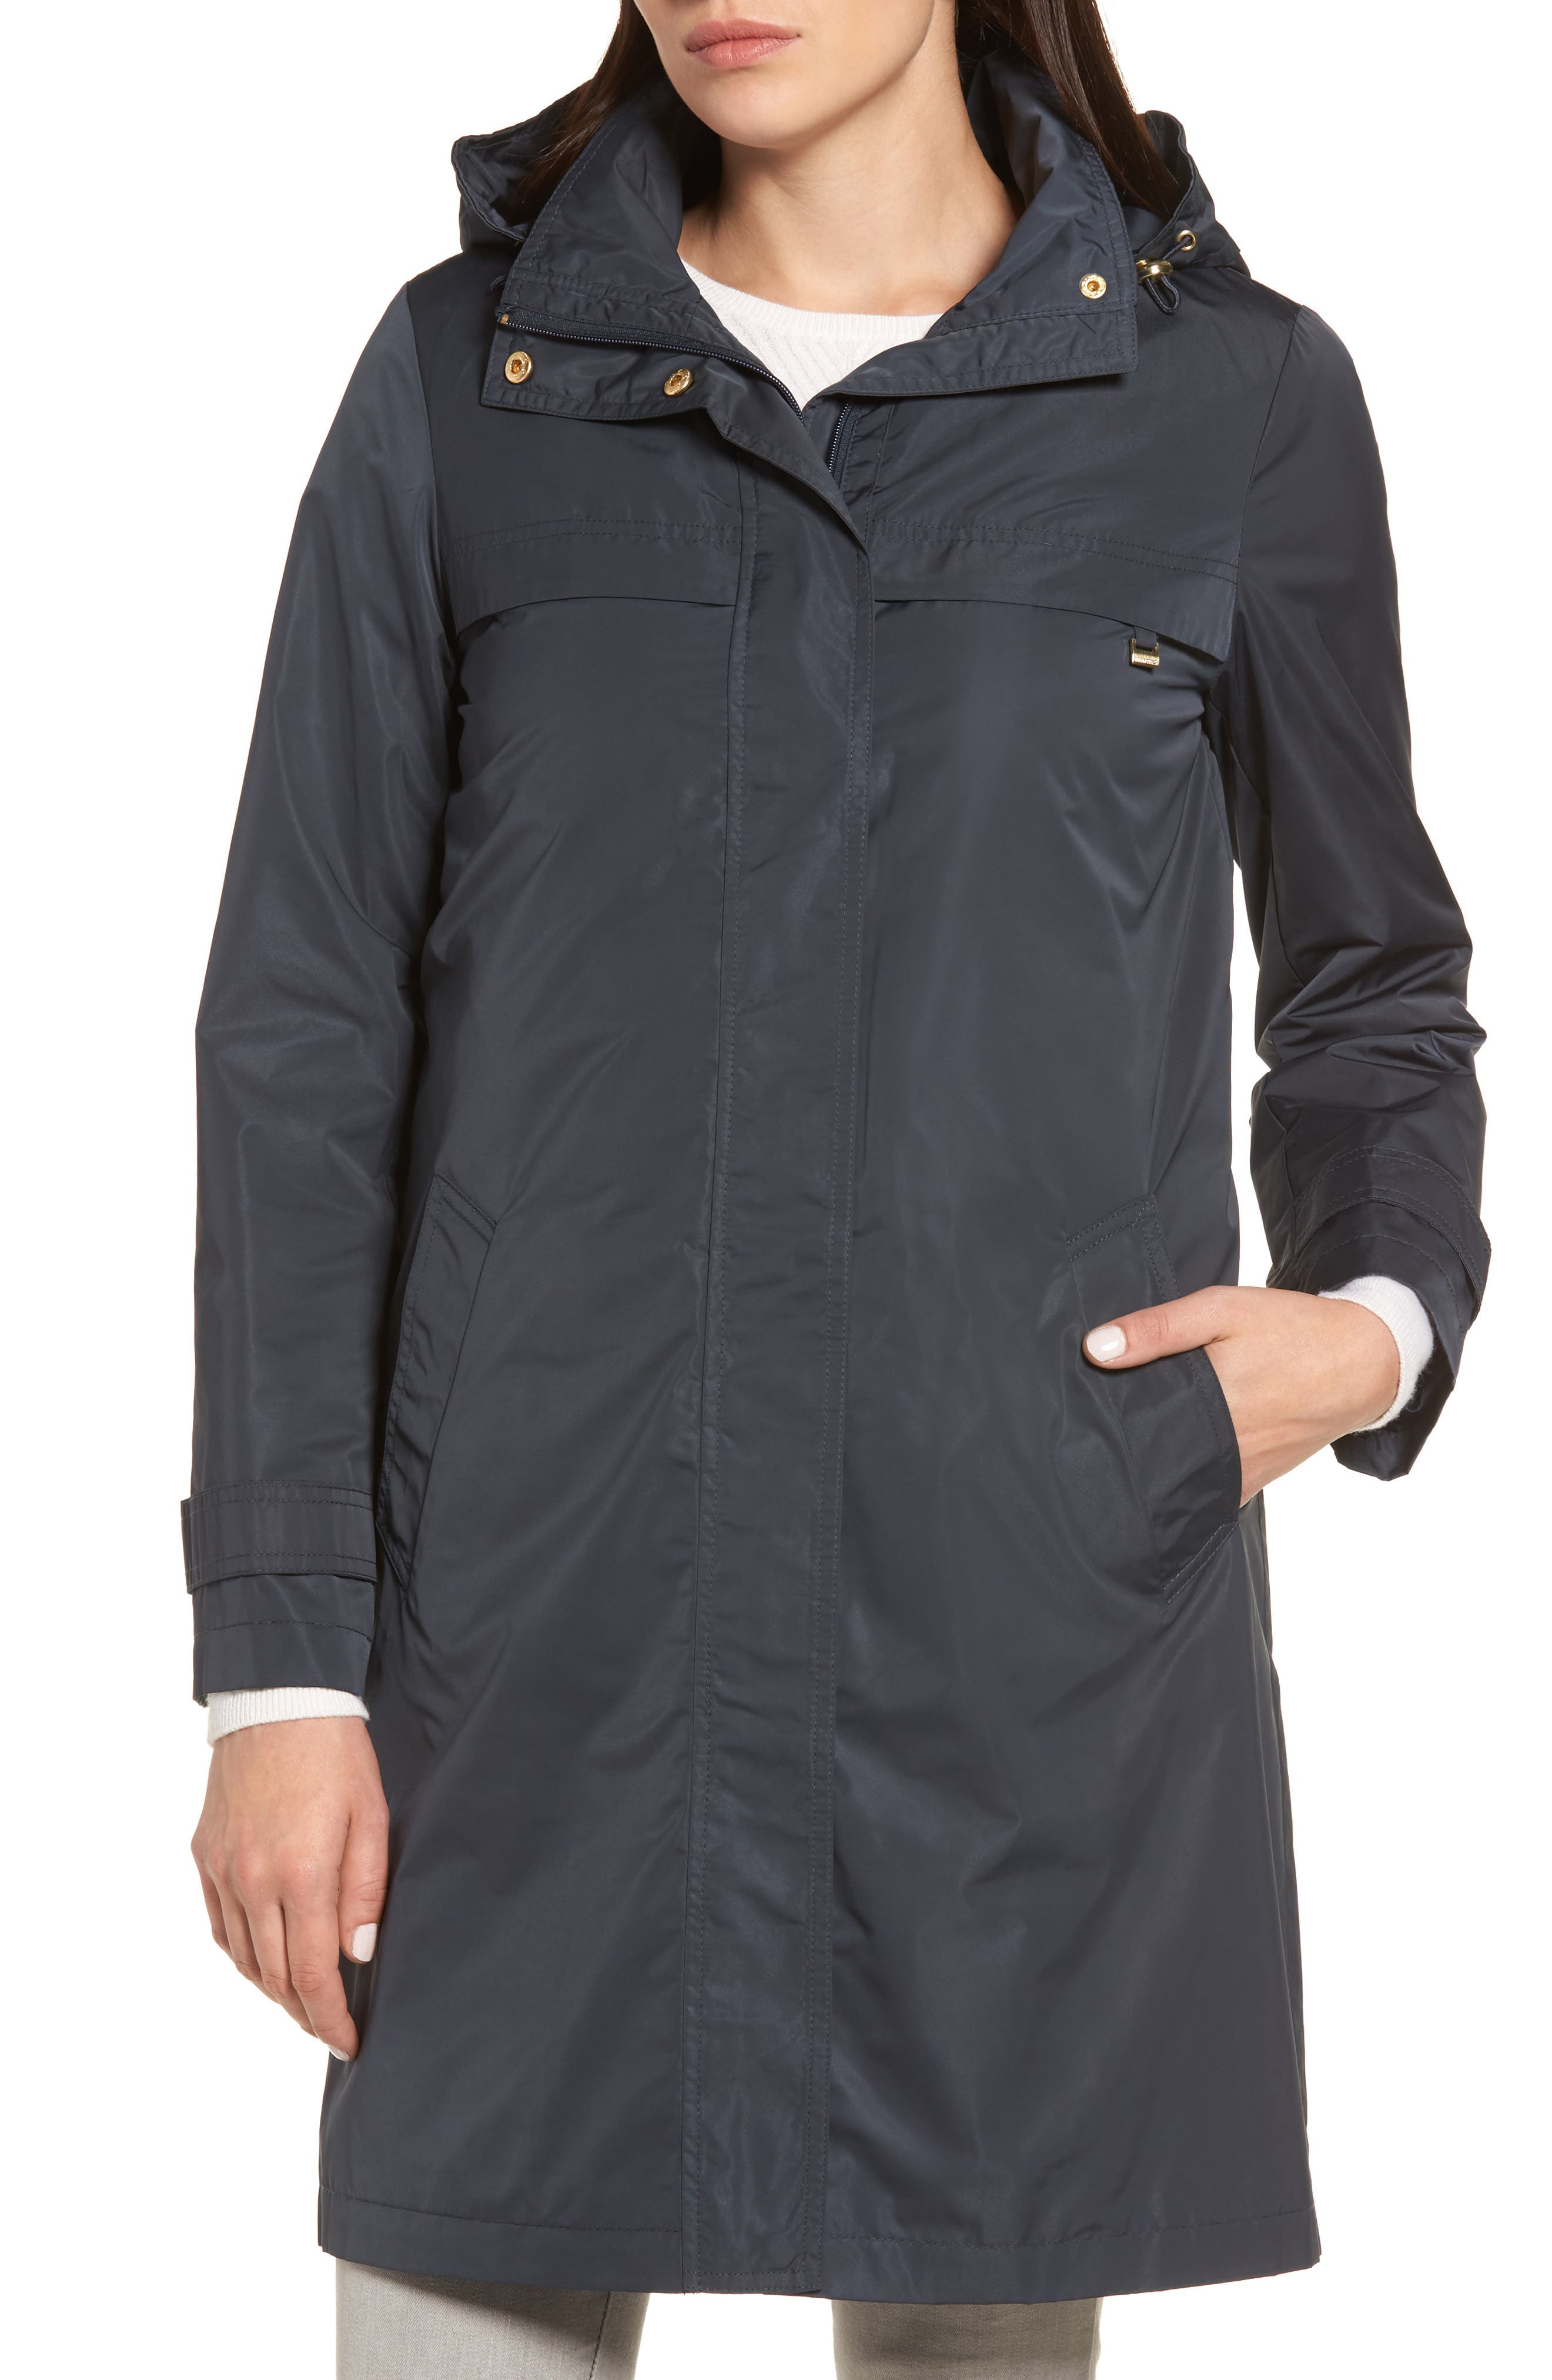 ELLEN TRACY Raincoat with Detachable Hood, Main, color, 410